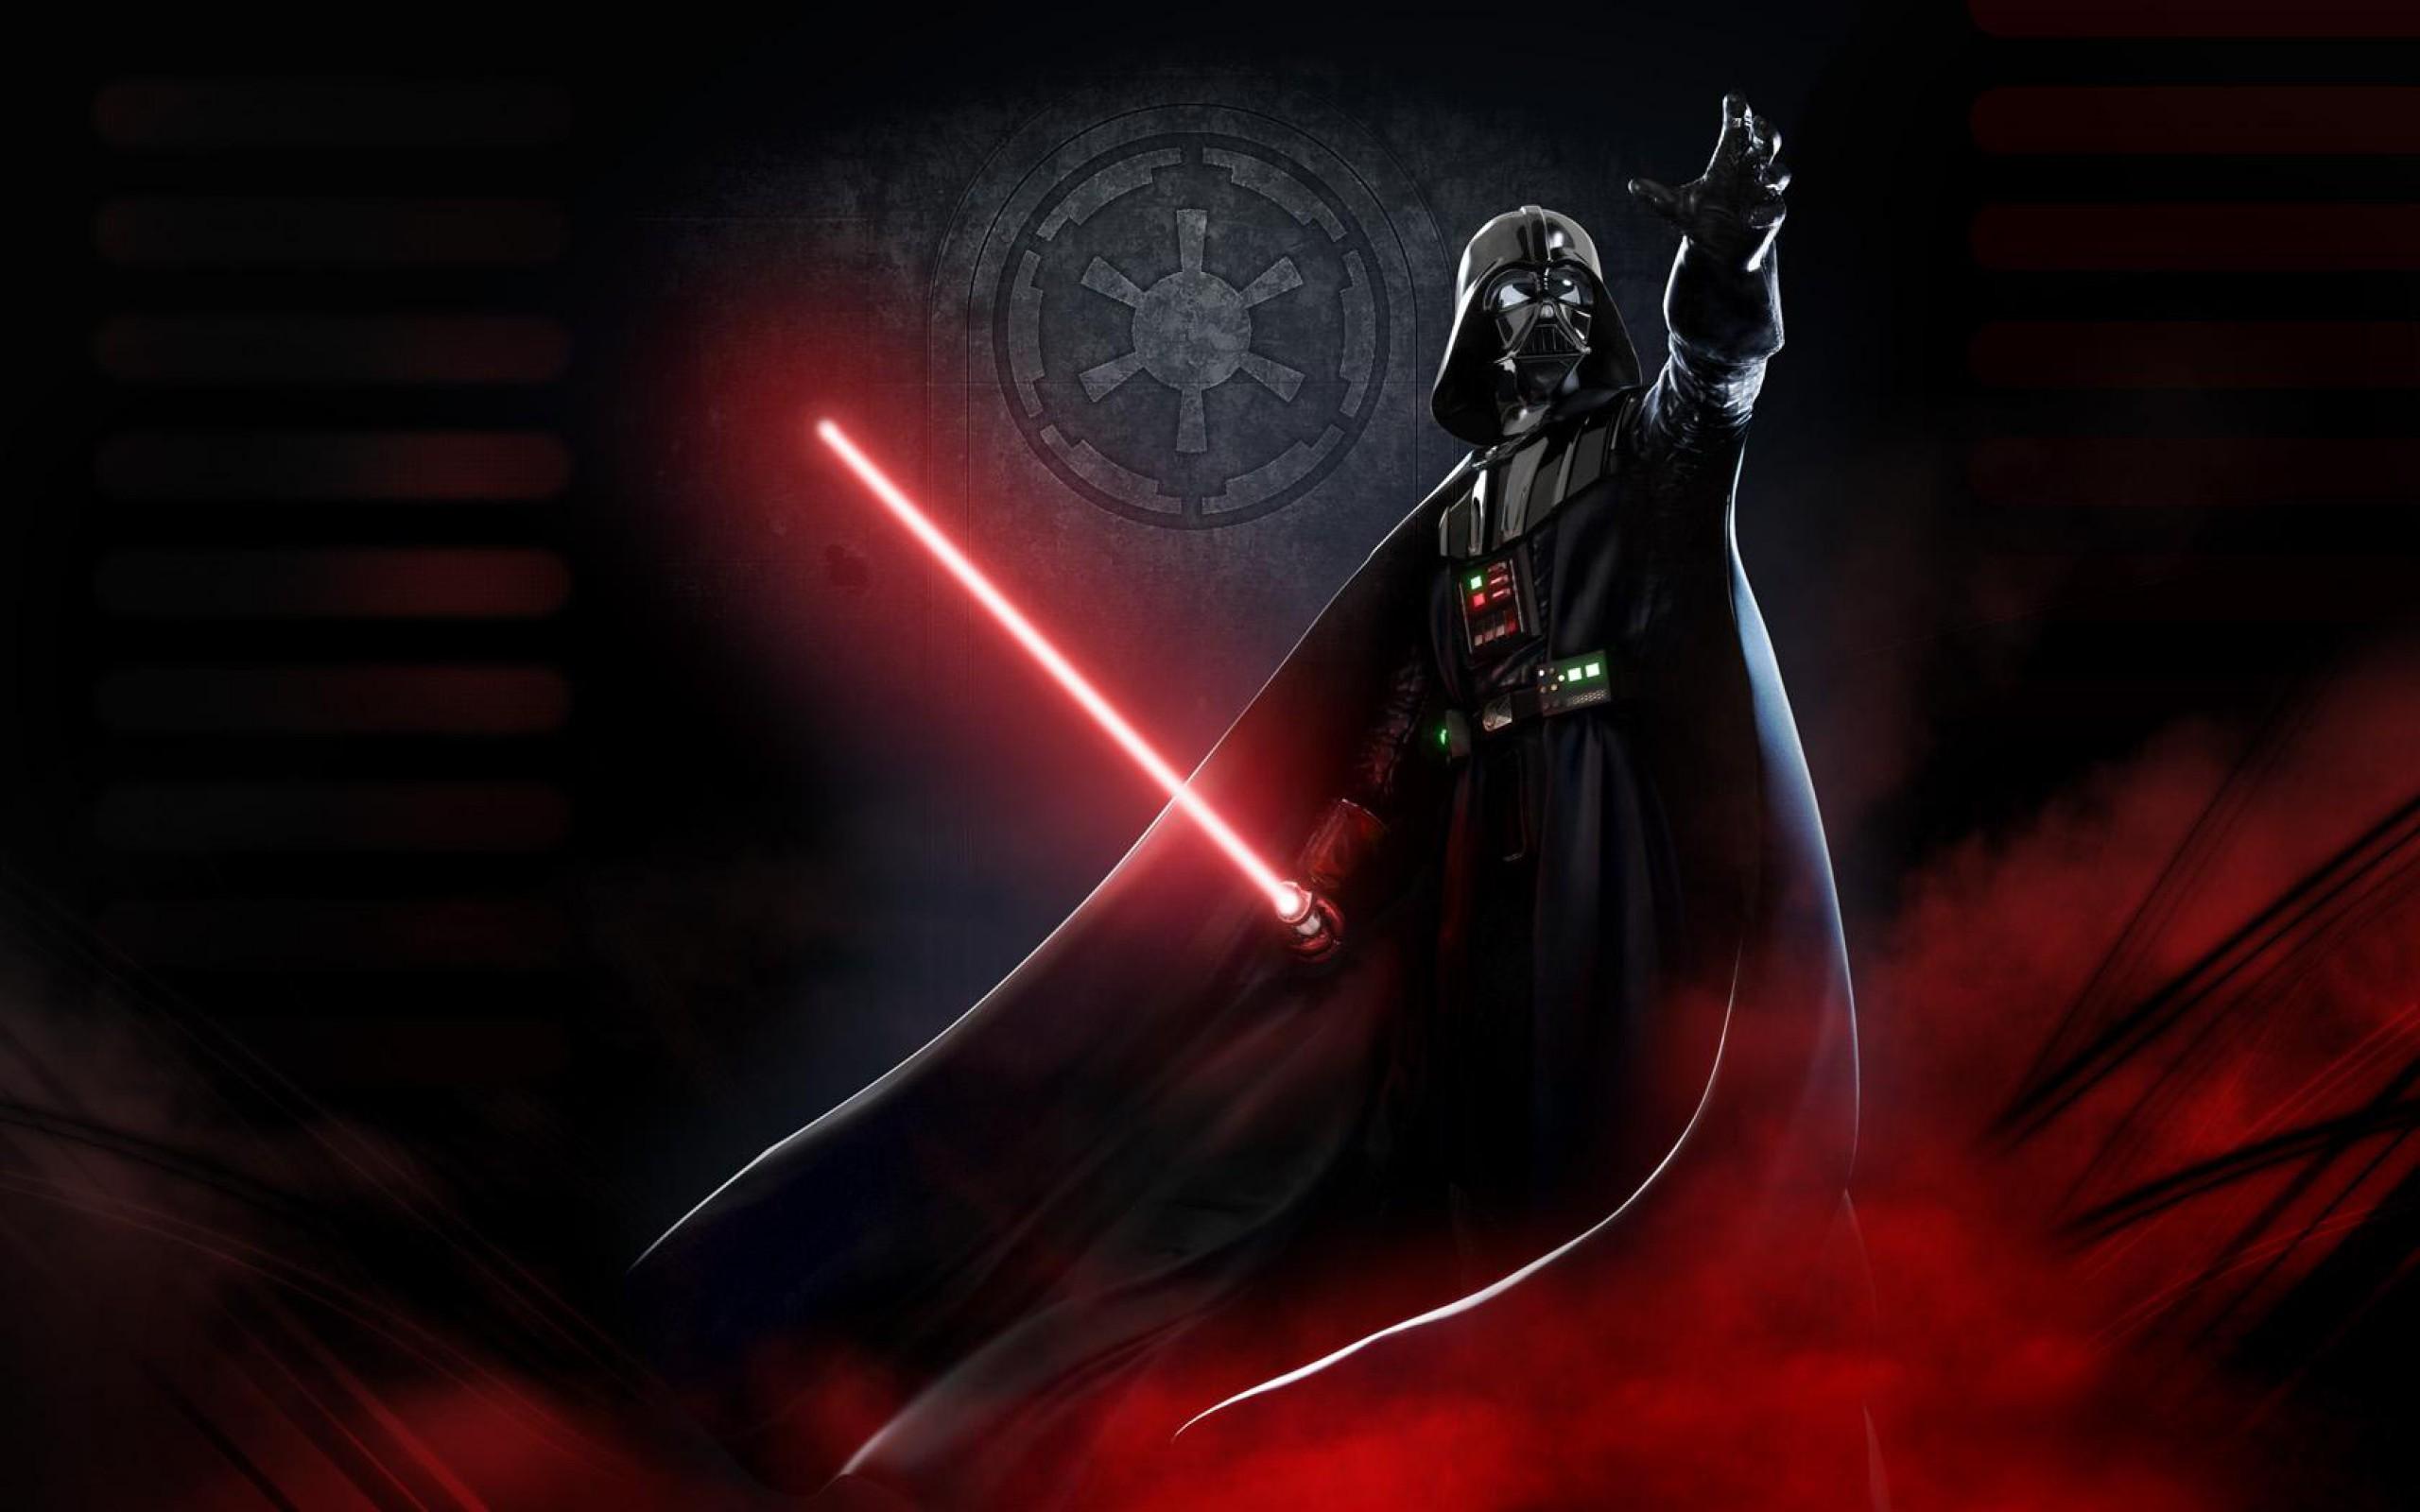 Walllaper La fuerza Darth Vader